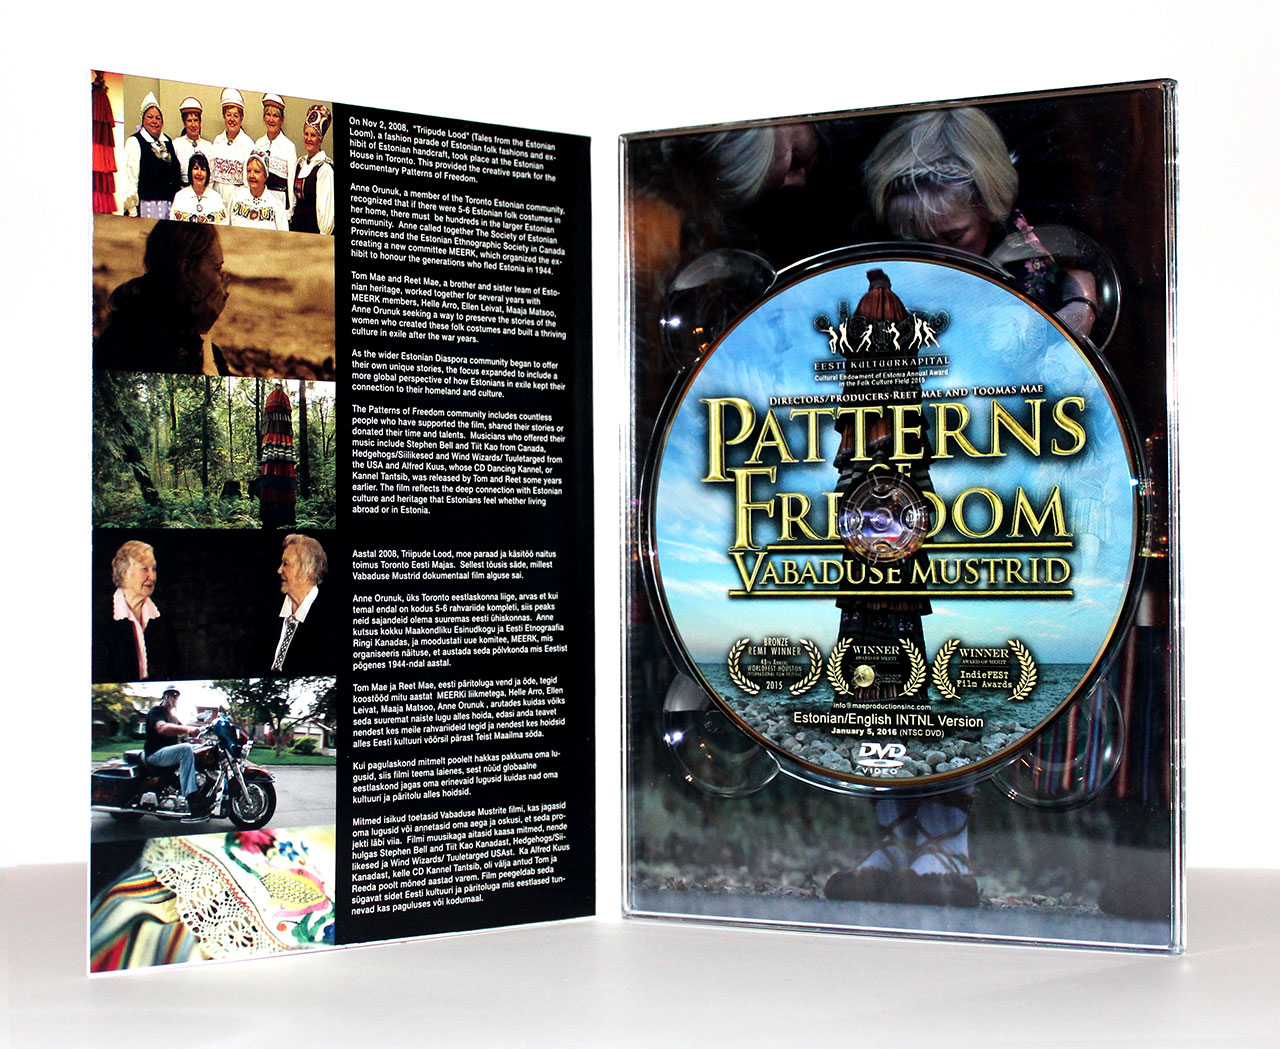 DVD 4-Panel Digipak